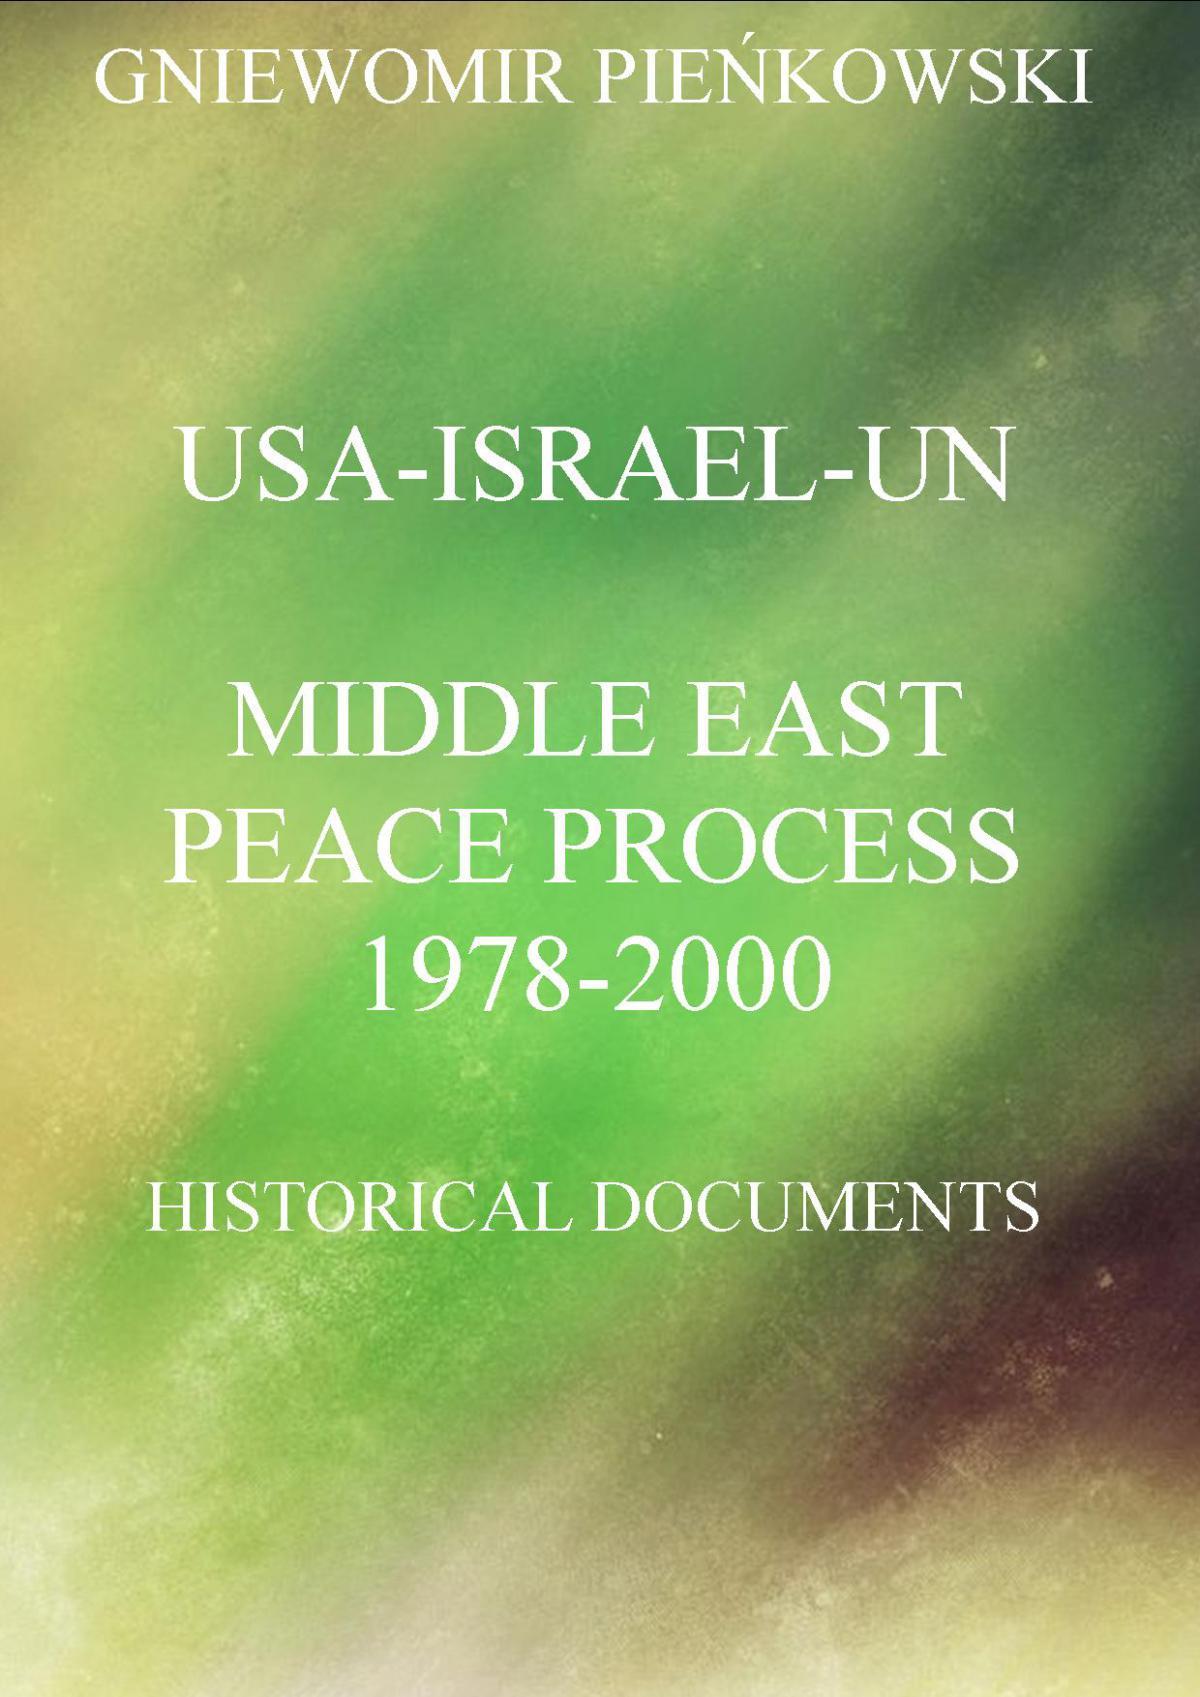 USA-Israel-UN.Middle East Peace Process: 1978-2000. Historical Documents - Ebook (Książka PDF) do pobrania w formacie PDF